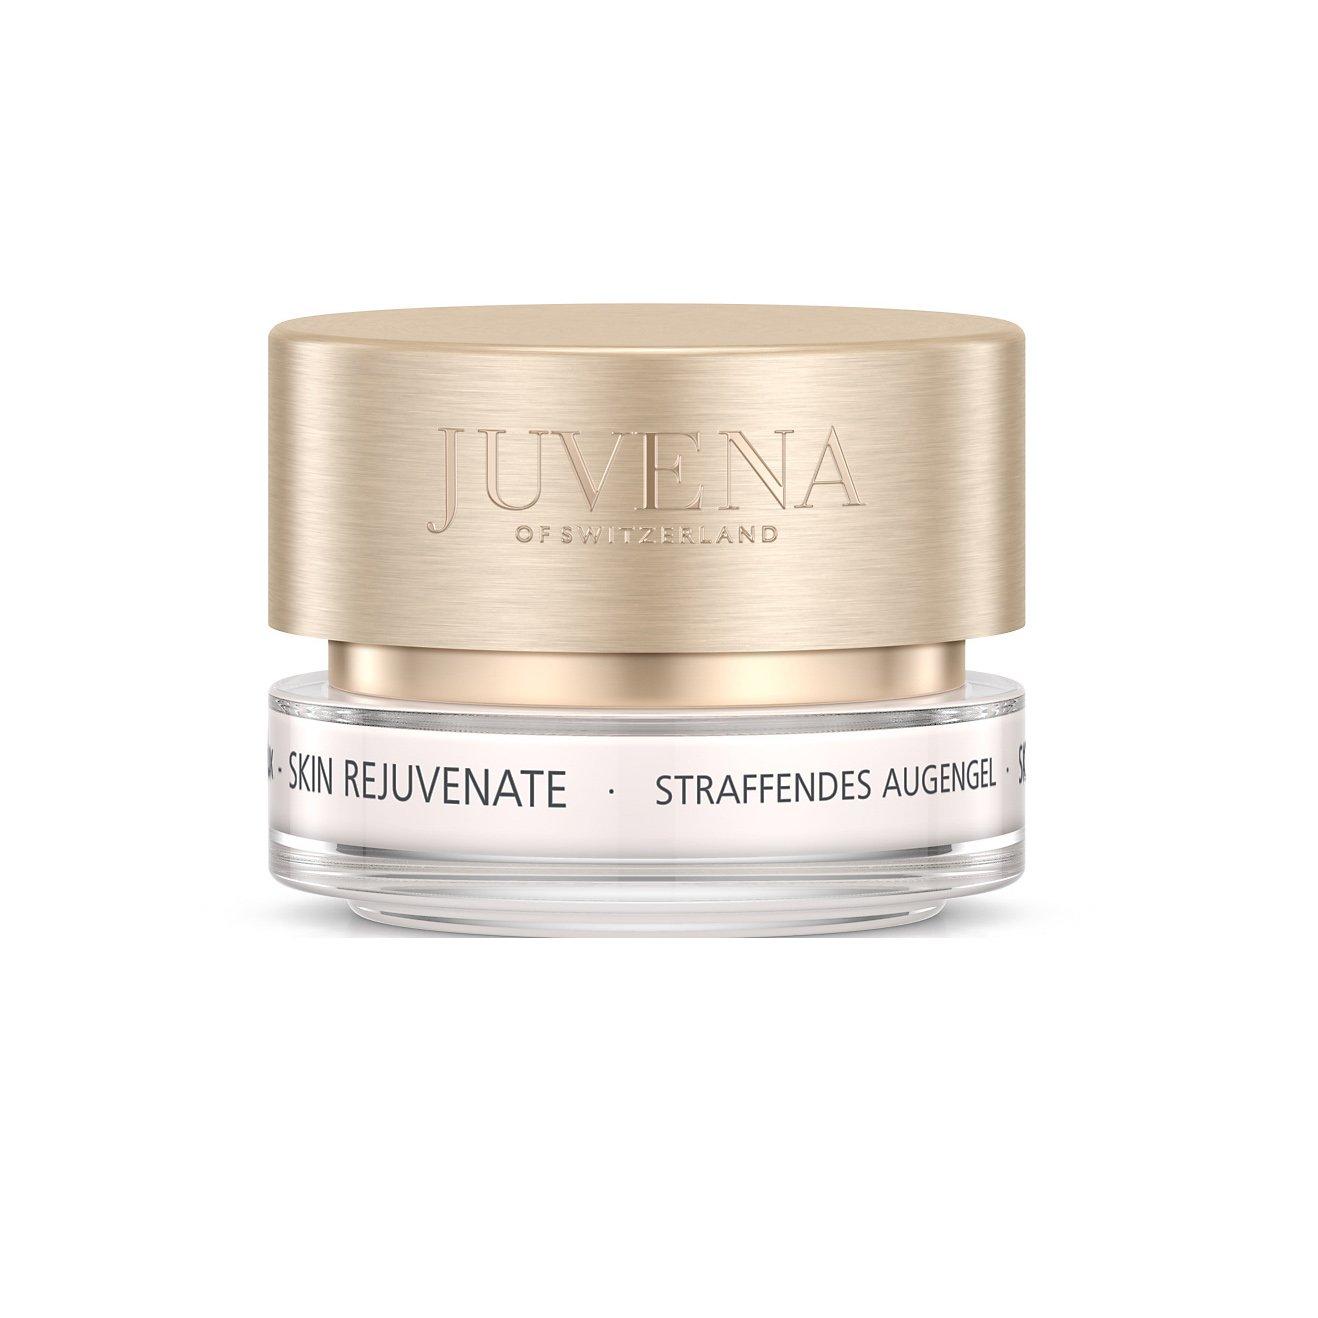 Juvena Skin Rejuvenate Lifting Eye Gel Αντιγηραντικό Gel Διπλής Δράσης που Συσφίγγει Ορατά την Περιοχή Γύρω Από τα Μάτια 15ml